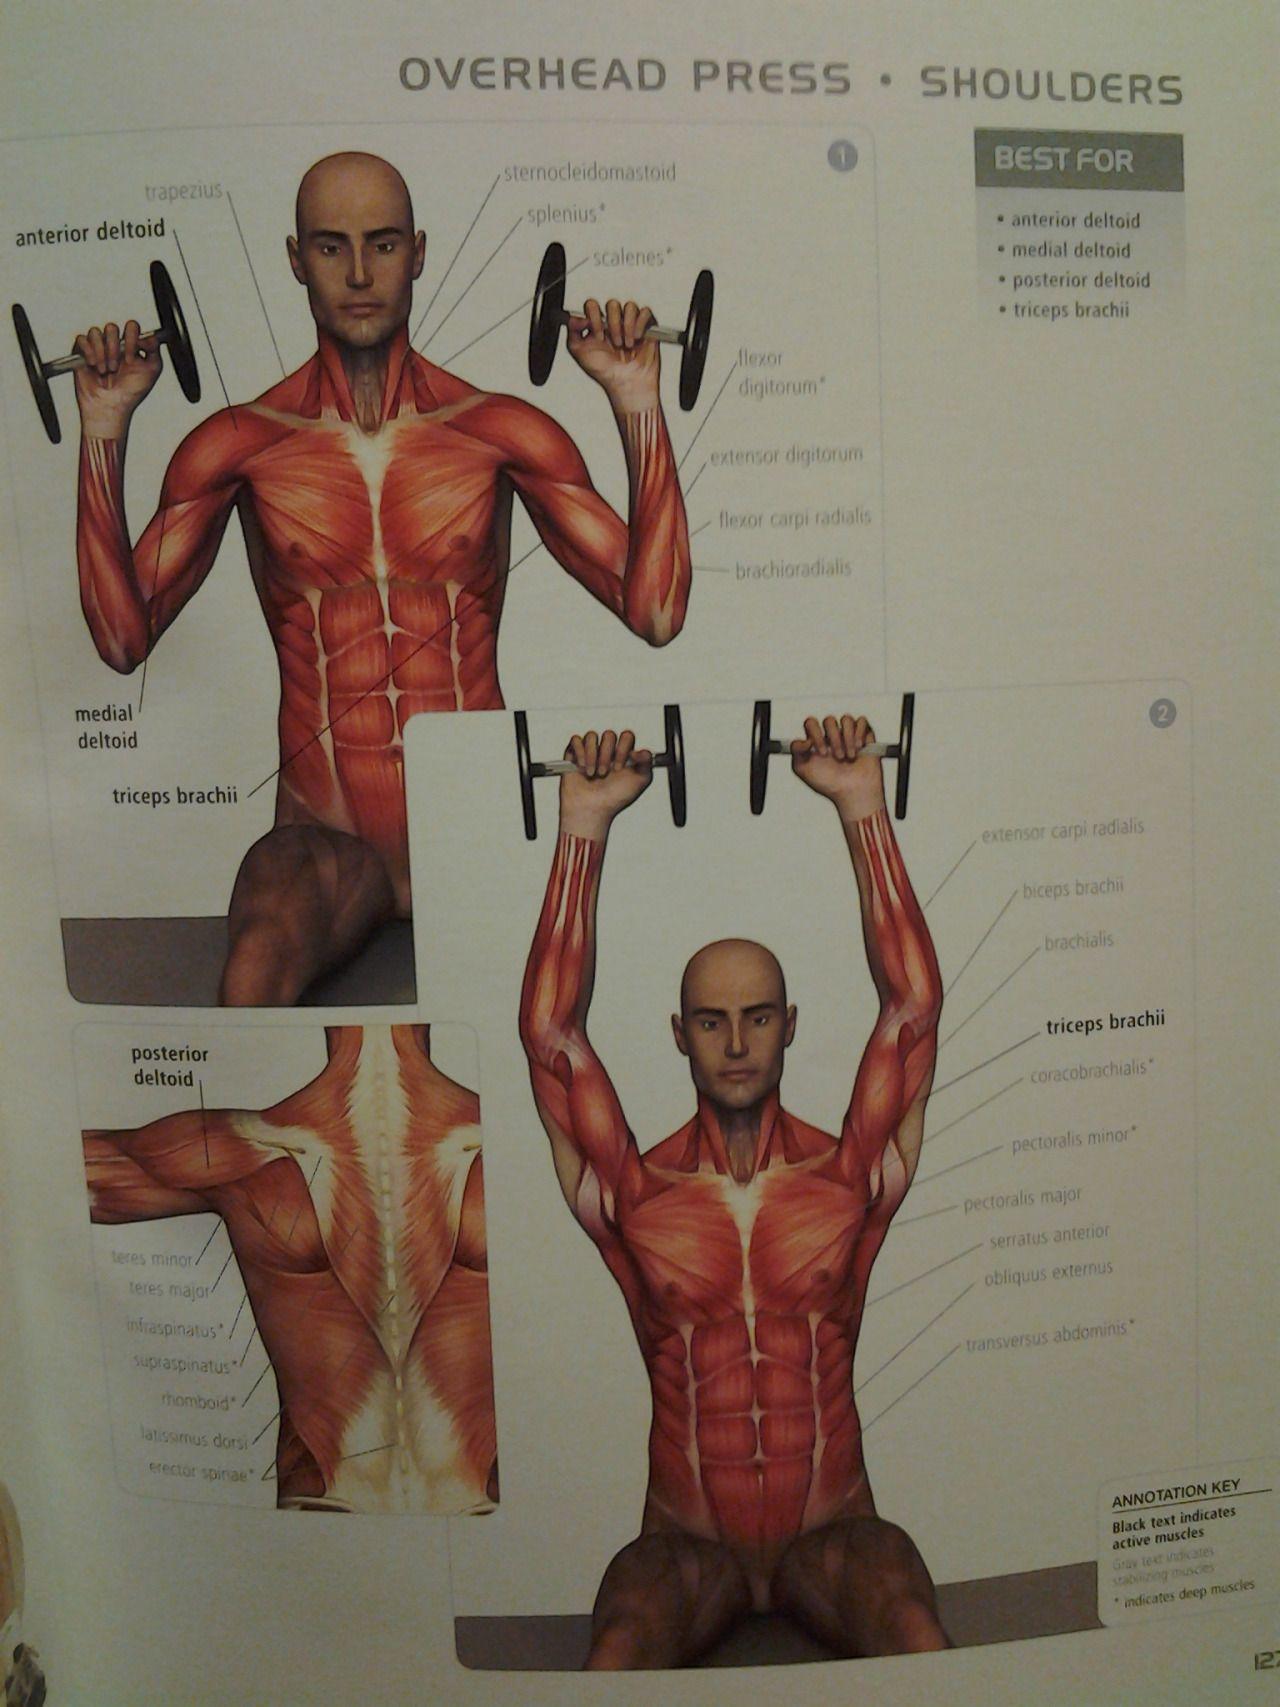 Triceps Brachii Diagram R34 Rb25det Wiring Shoulders Overhead Press Ant Medial Post Deltoid